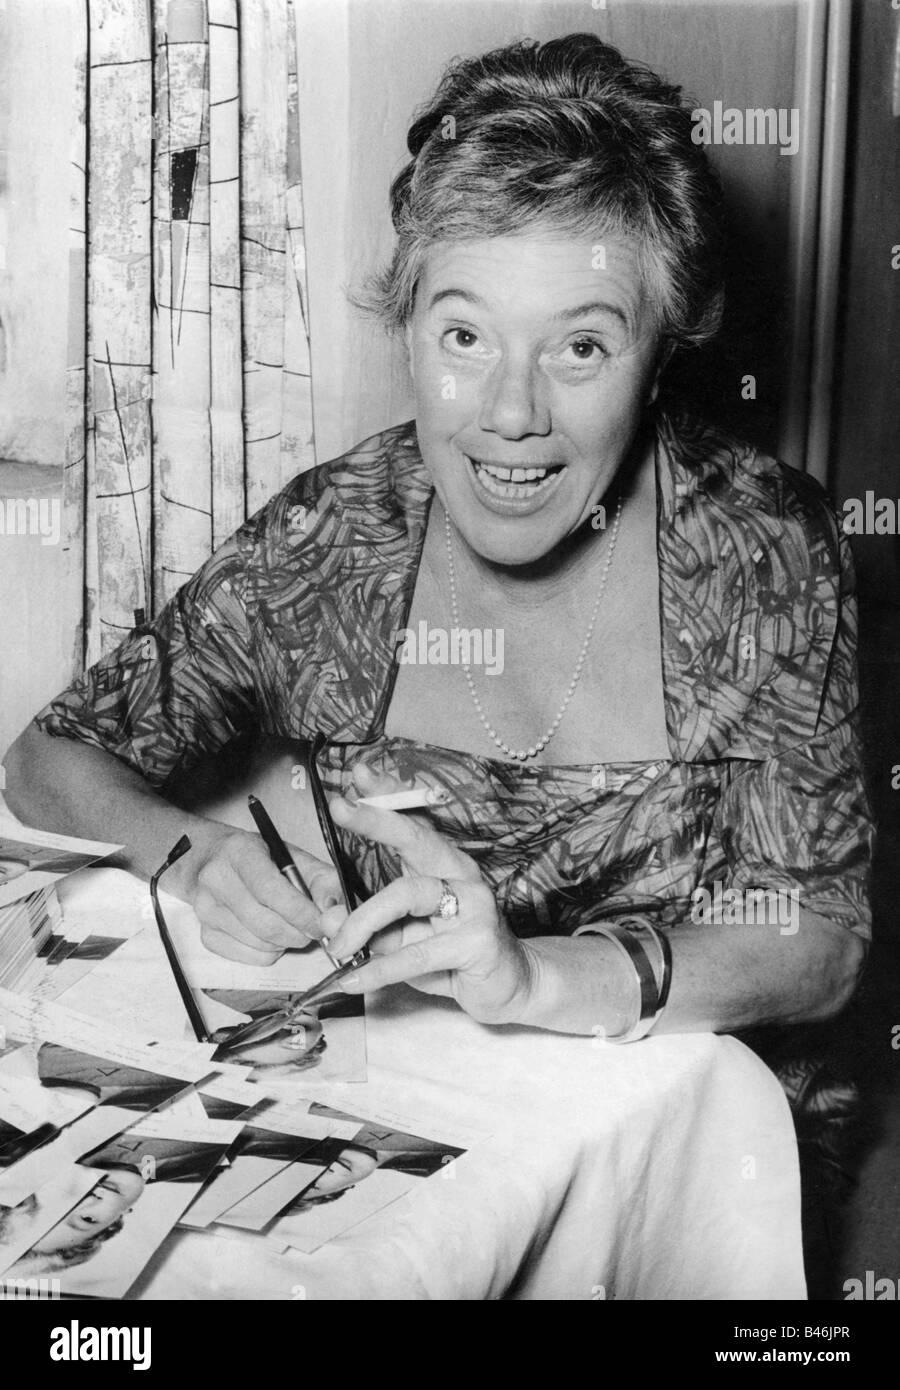 Herking, Ursula, 28.1.1912 - 17.11.1974, German actress, half length, premiere of 'Pension Schoeller', Turmpalast, - Stock Image